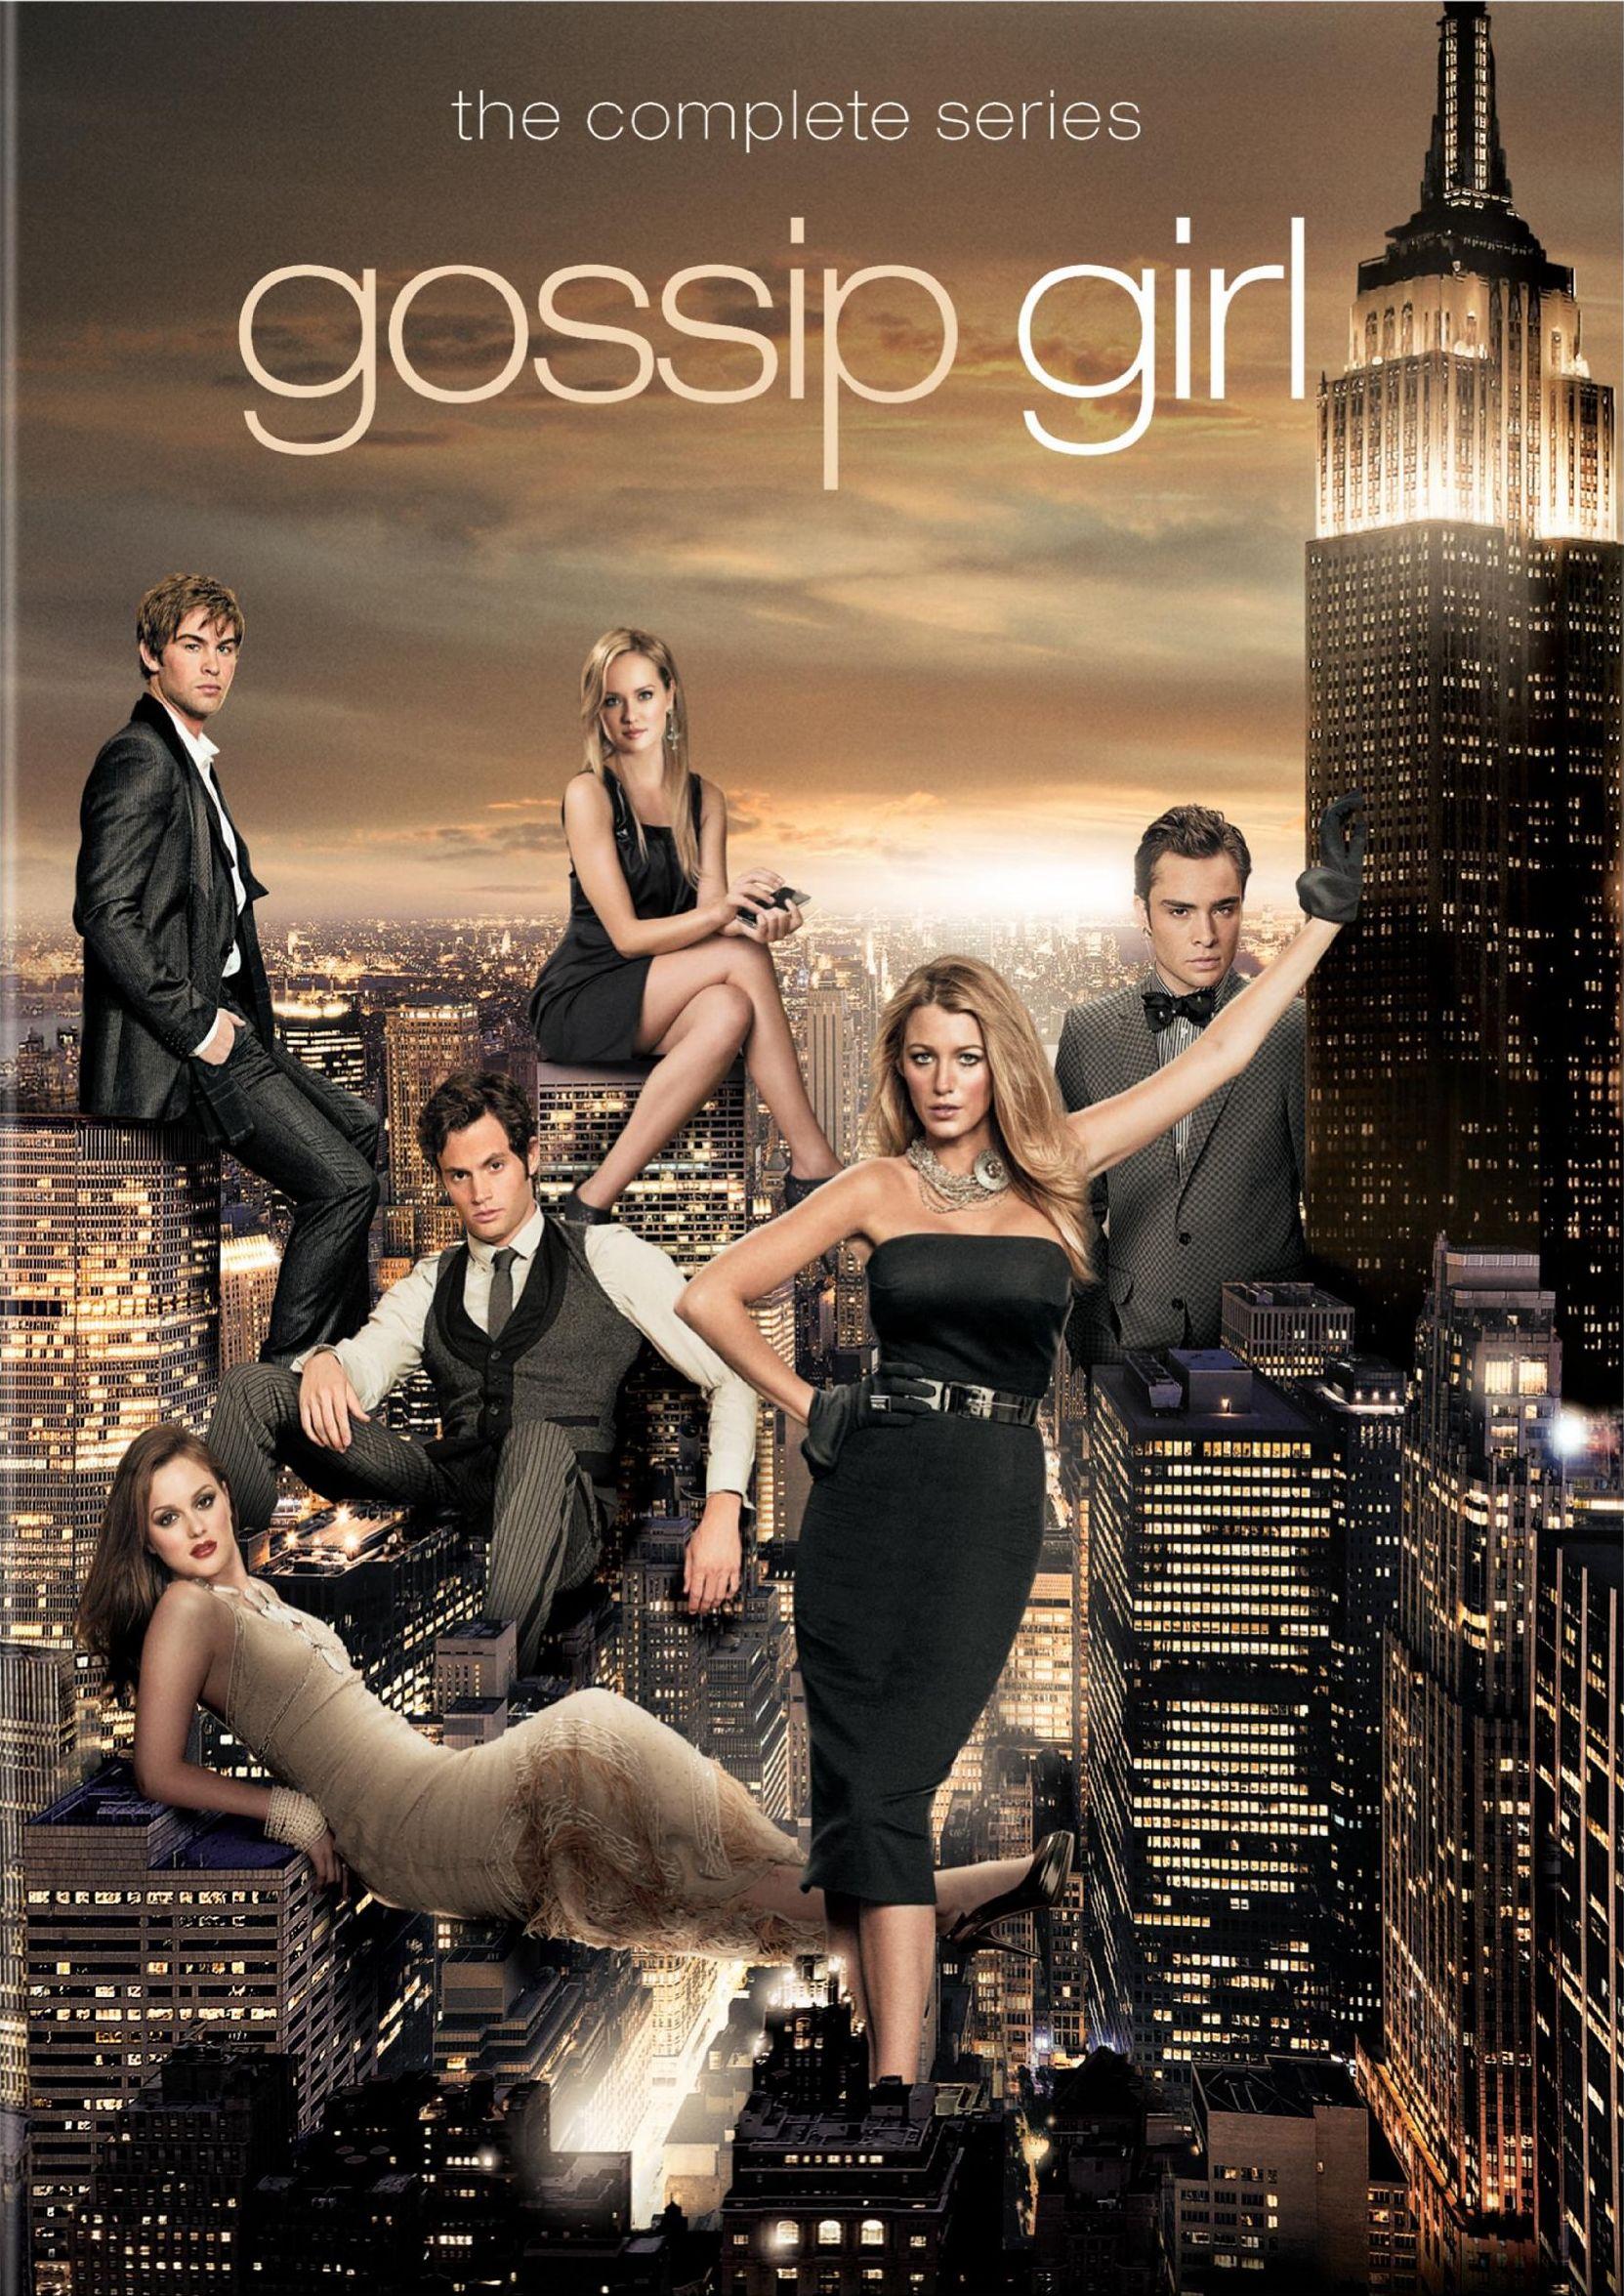 Chair Gossip Girl Wallpaper Gossip Girl Dvd Release Date